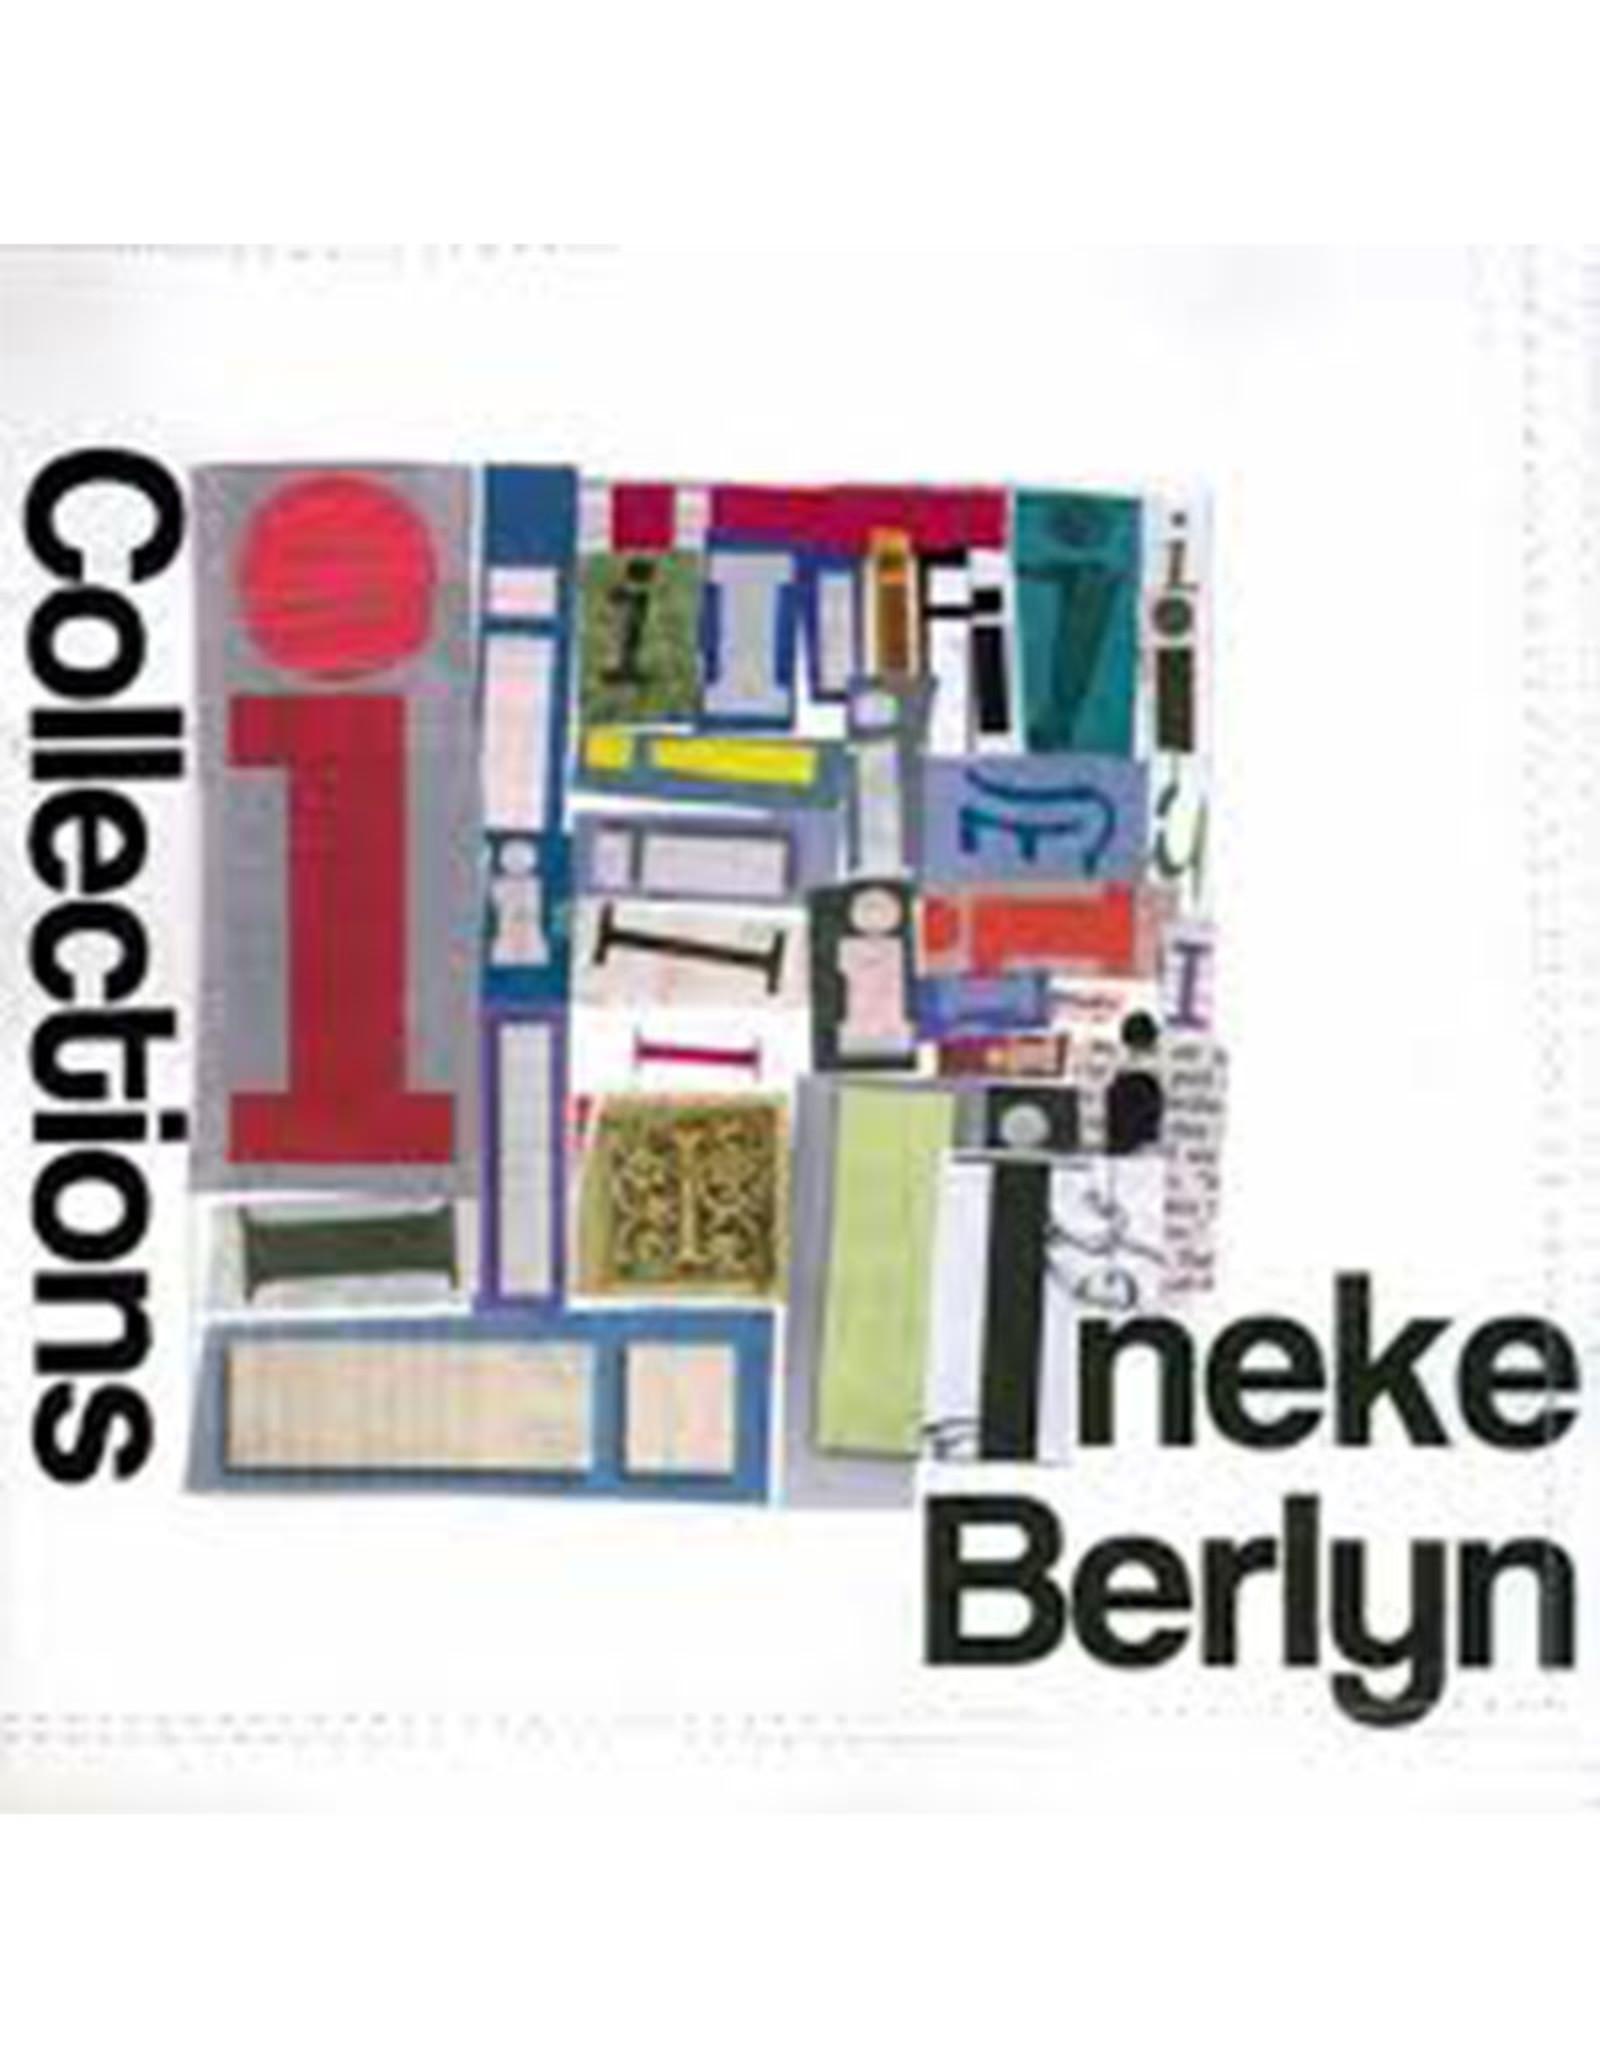 Collections / Ineke Berlyn